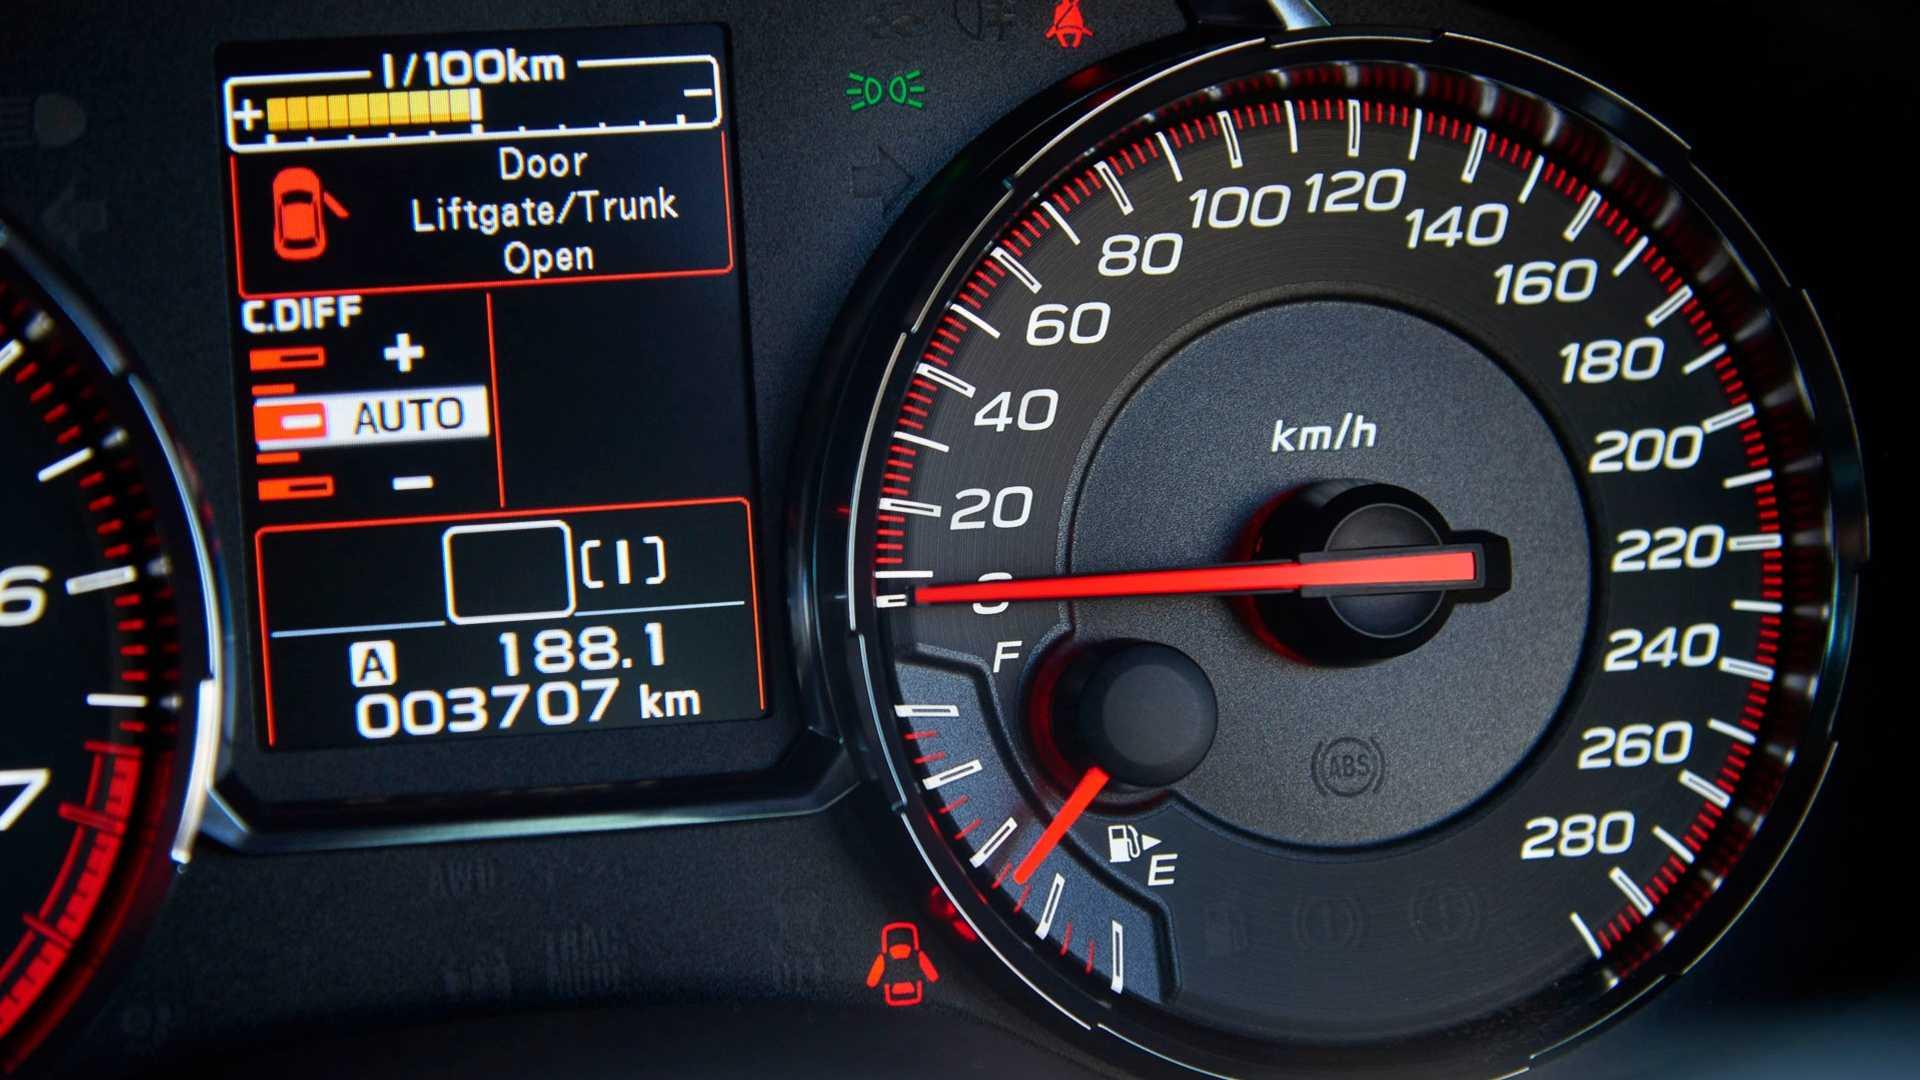 Subaru презентовала самую мощную серийную WRX STI 3